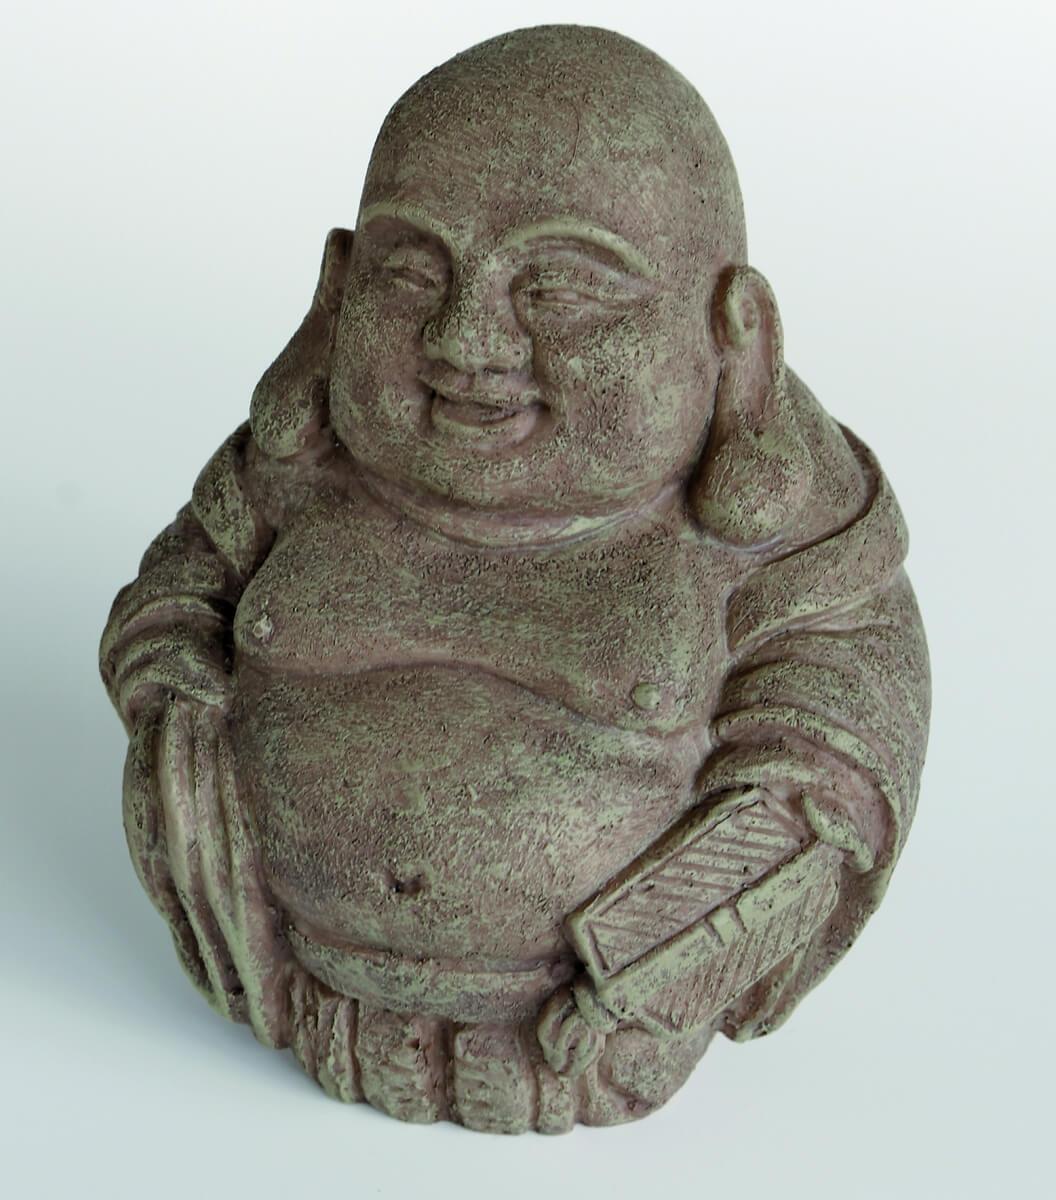 Decoracion Zen Acuario ~ decoraci?n zen laughing buda xl decoraci?n zen laughing buda xl